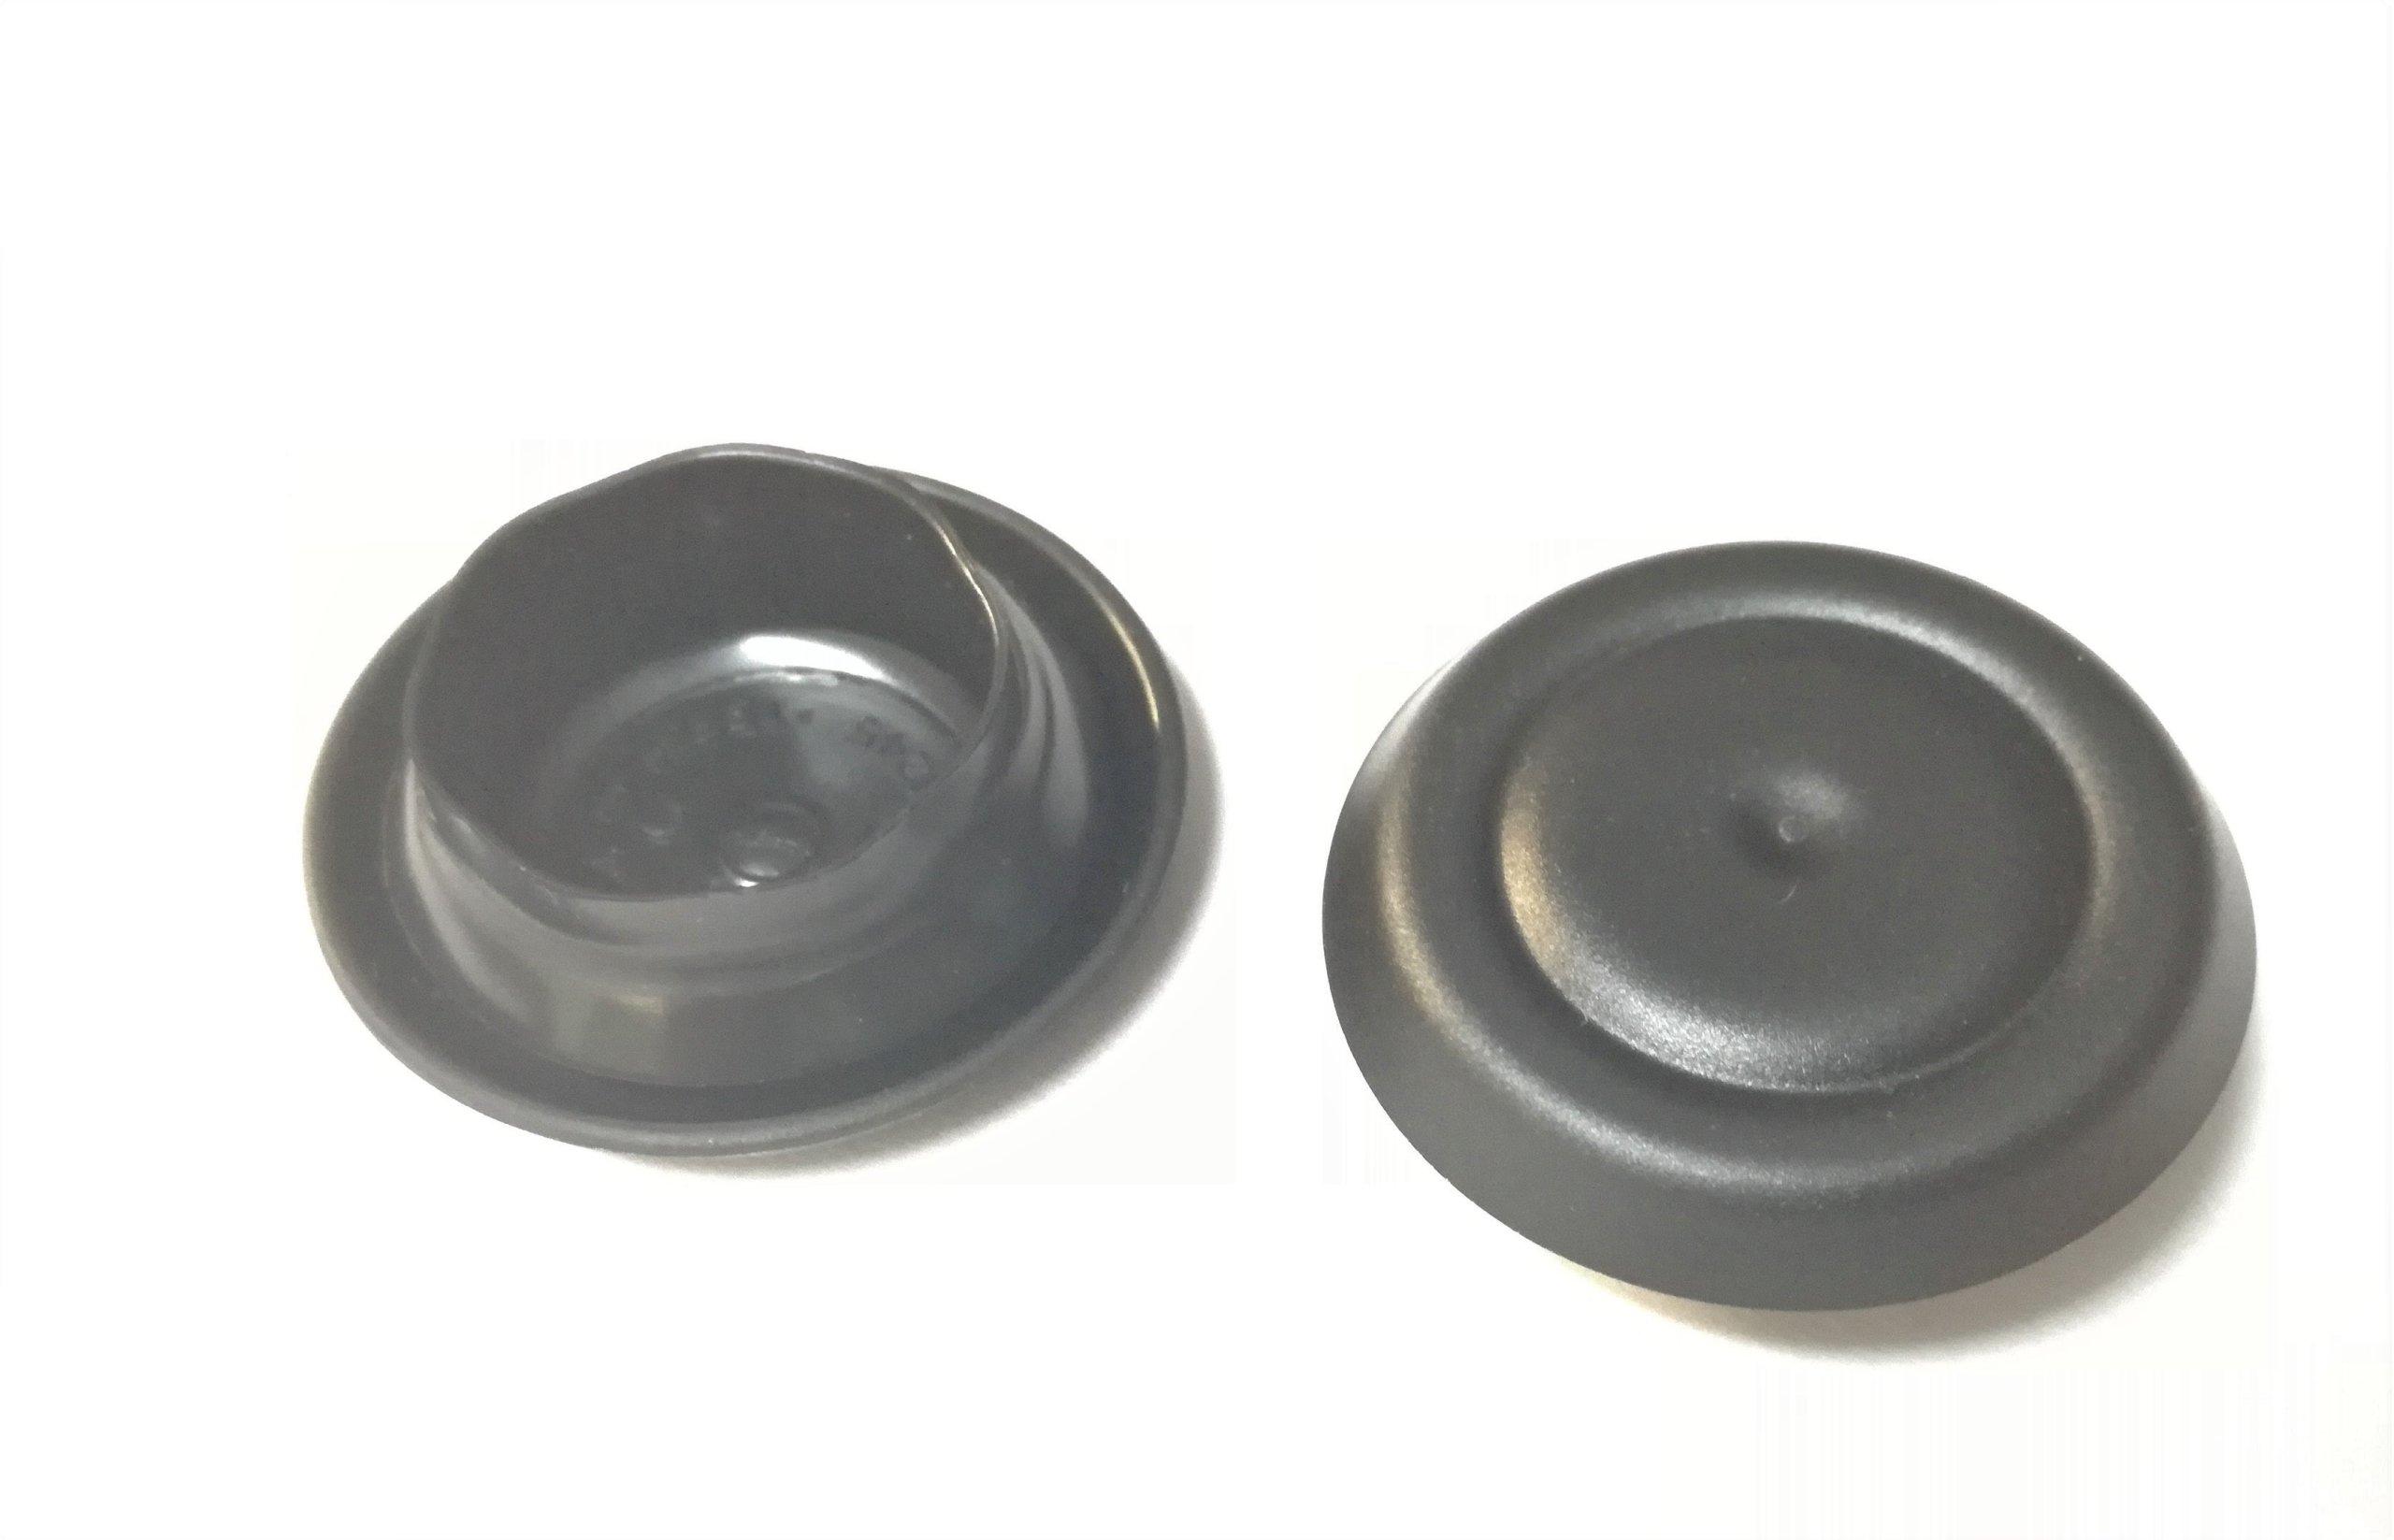 заглушка пробка шасси порога n10124501 размер 20mm